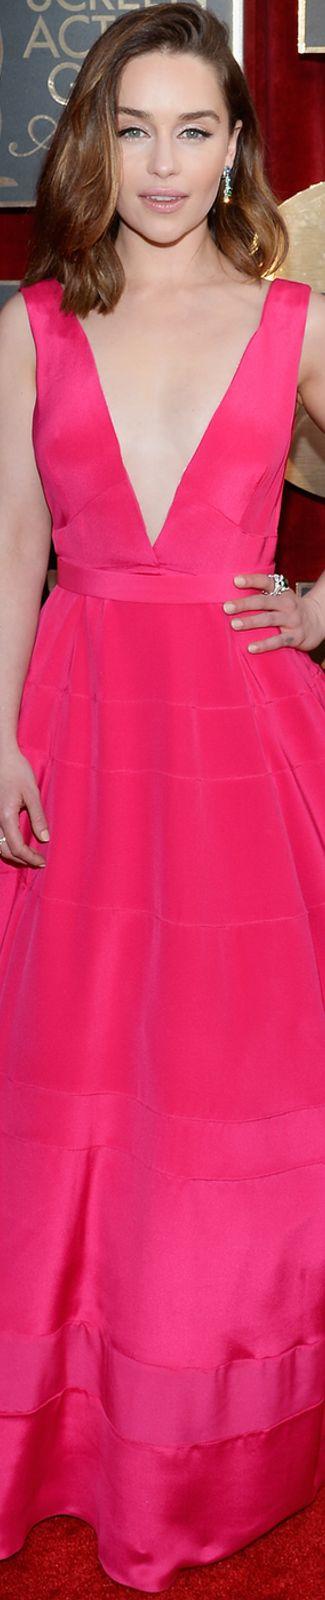 Emilia Clarke wearing Dior 2016 SAG Awards